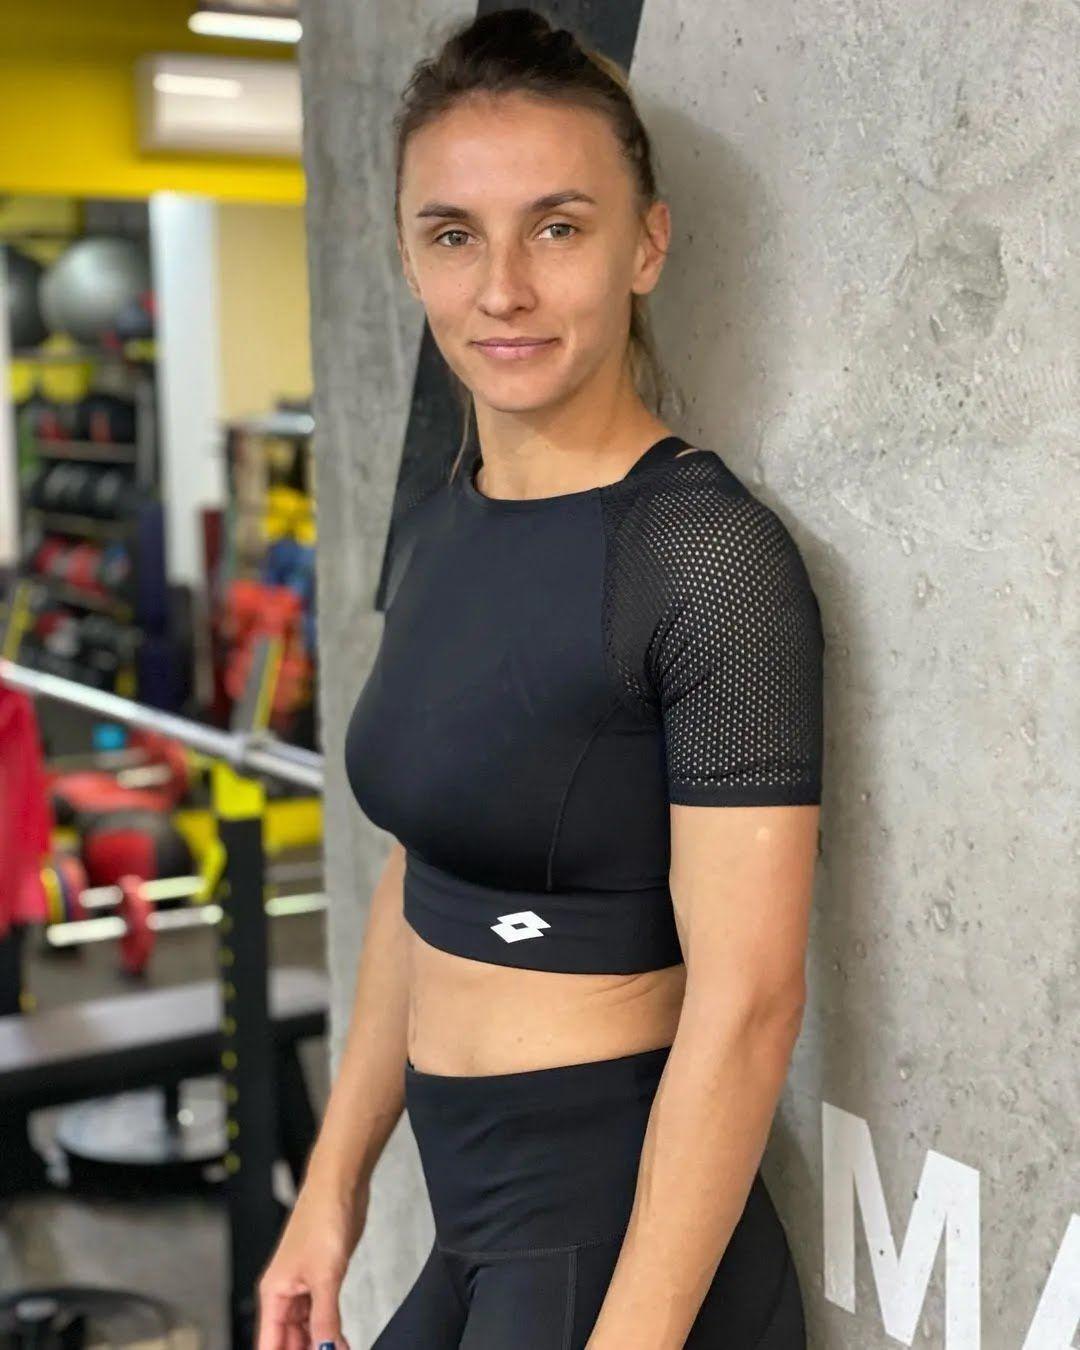 Леся Цуренко в тренажерном зале